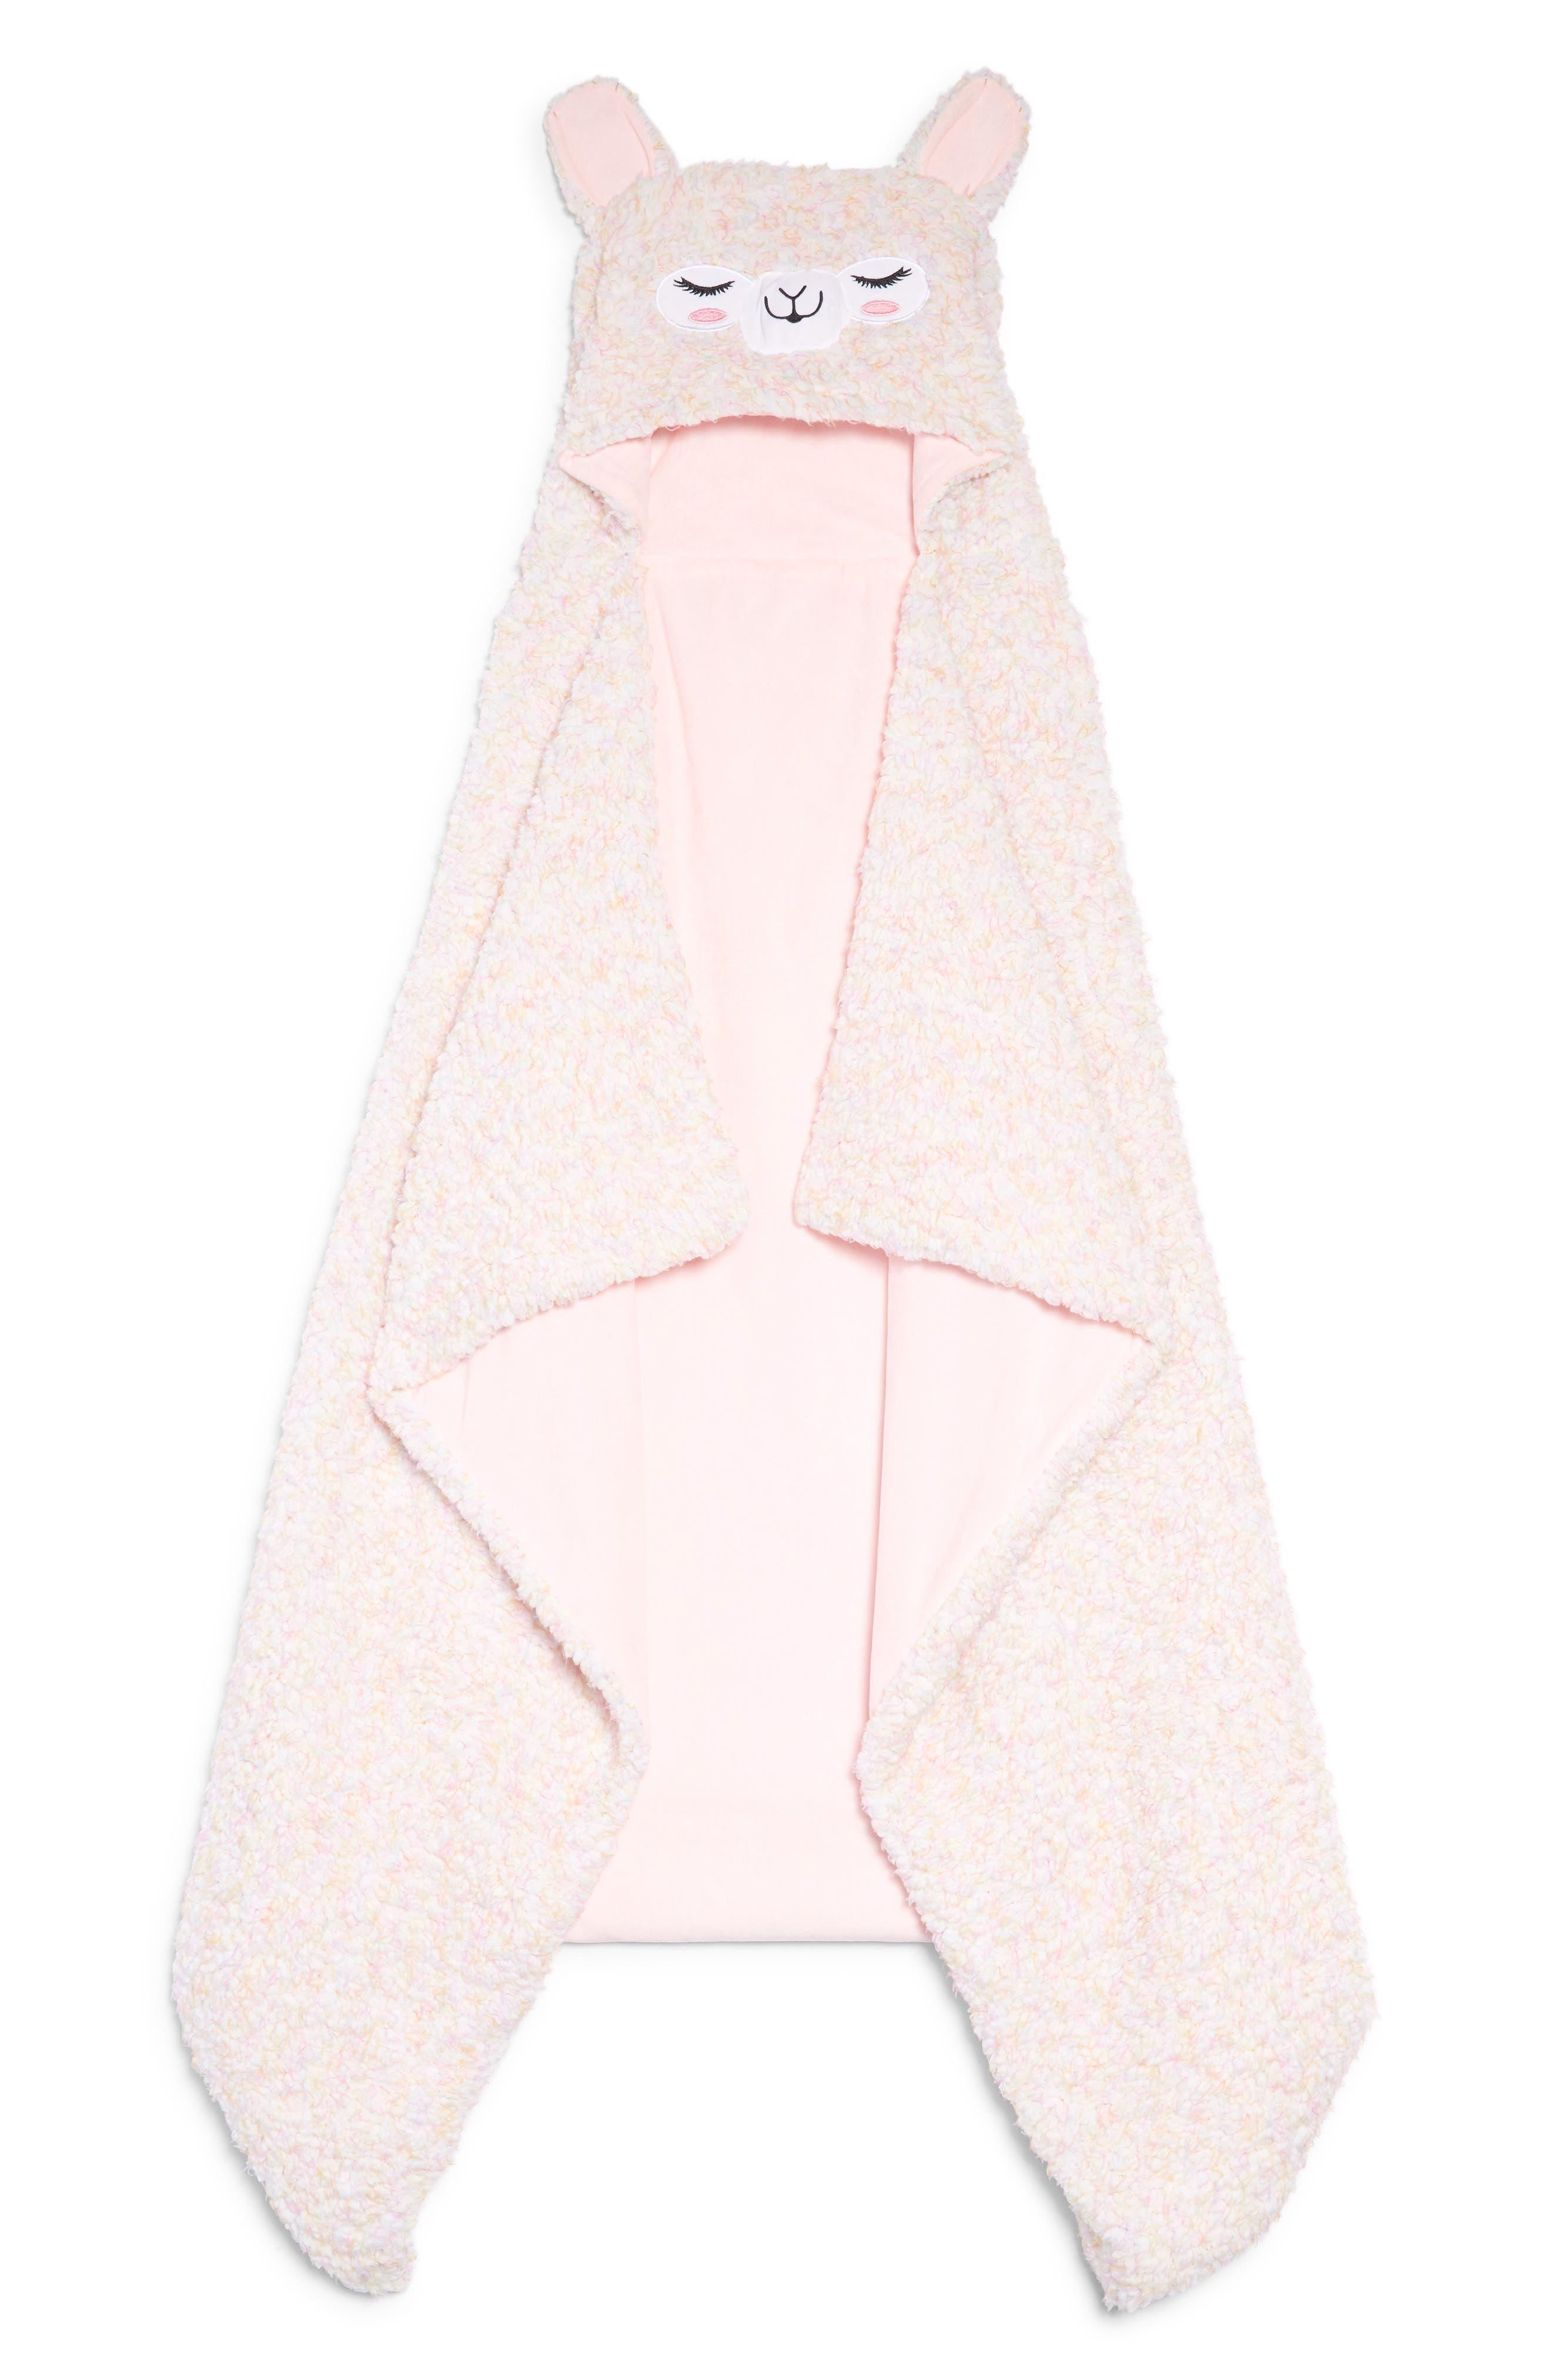 Alpaca Hooded Blanket,                             Main thumbnail 1, color,                             650